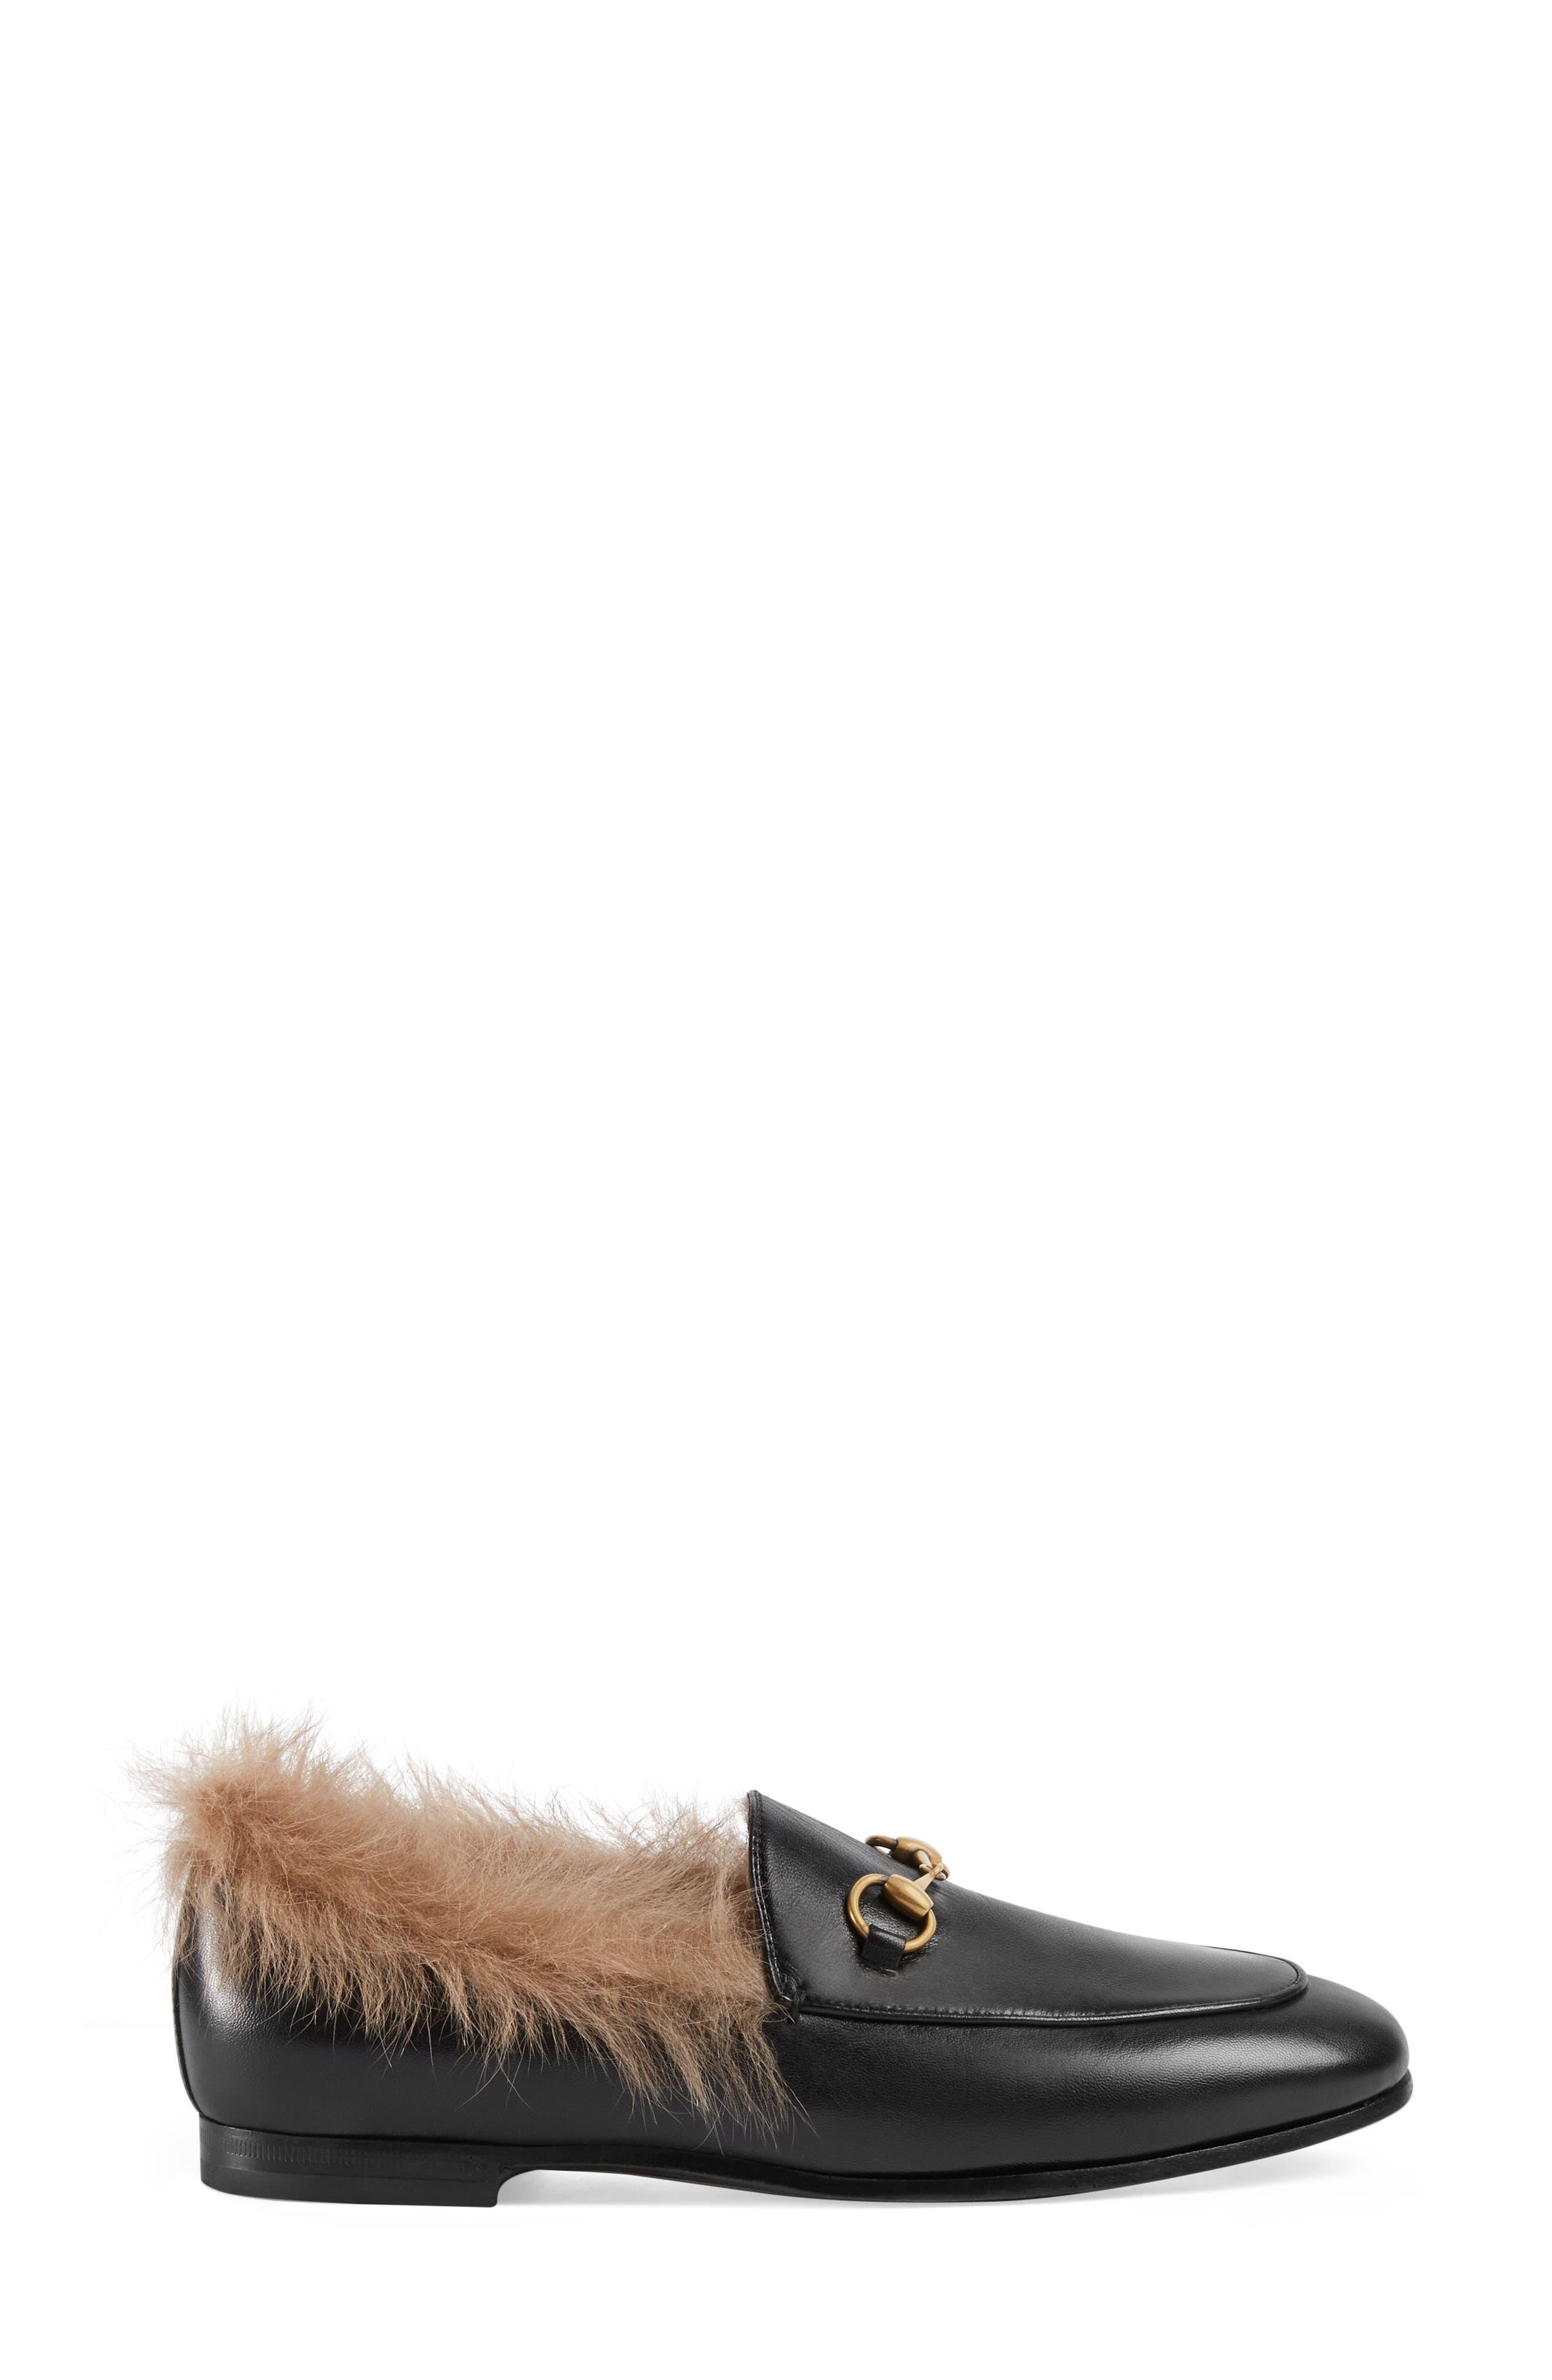 GUCCI, Jordaan Genuine Shearling Lining Loafer, Alternate thumbnail 2, color, BLACK